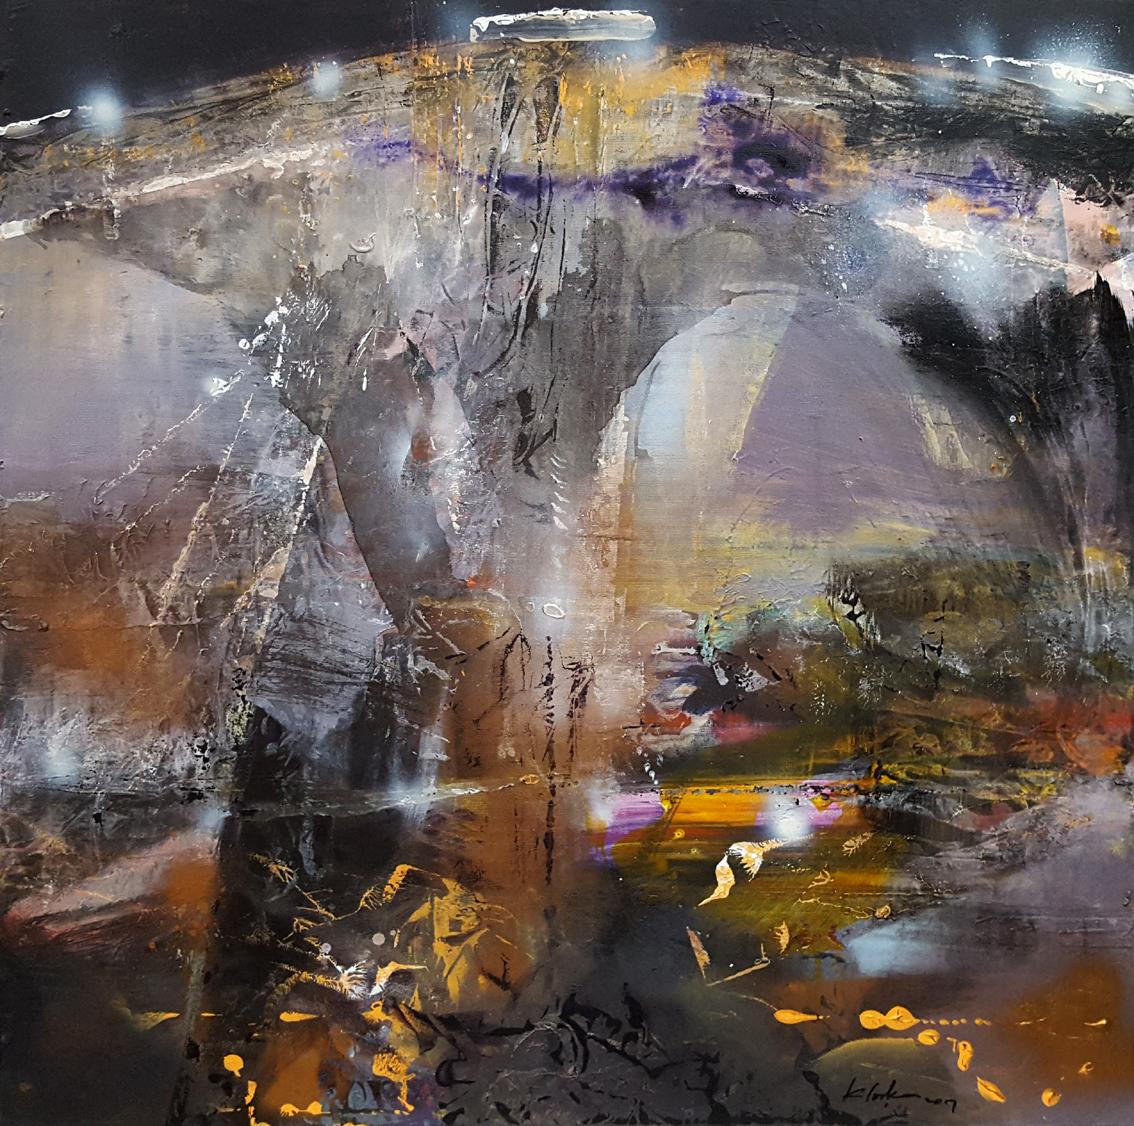 Large framed acrylic painting abstract mindscape lightscape melancholia nostalgia composition by O KLOSKA